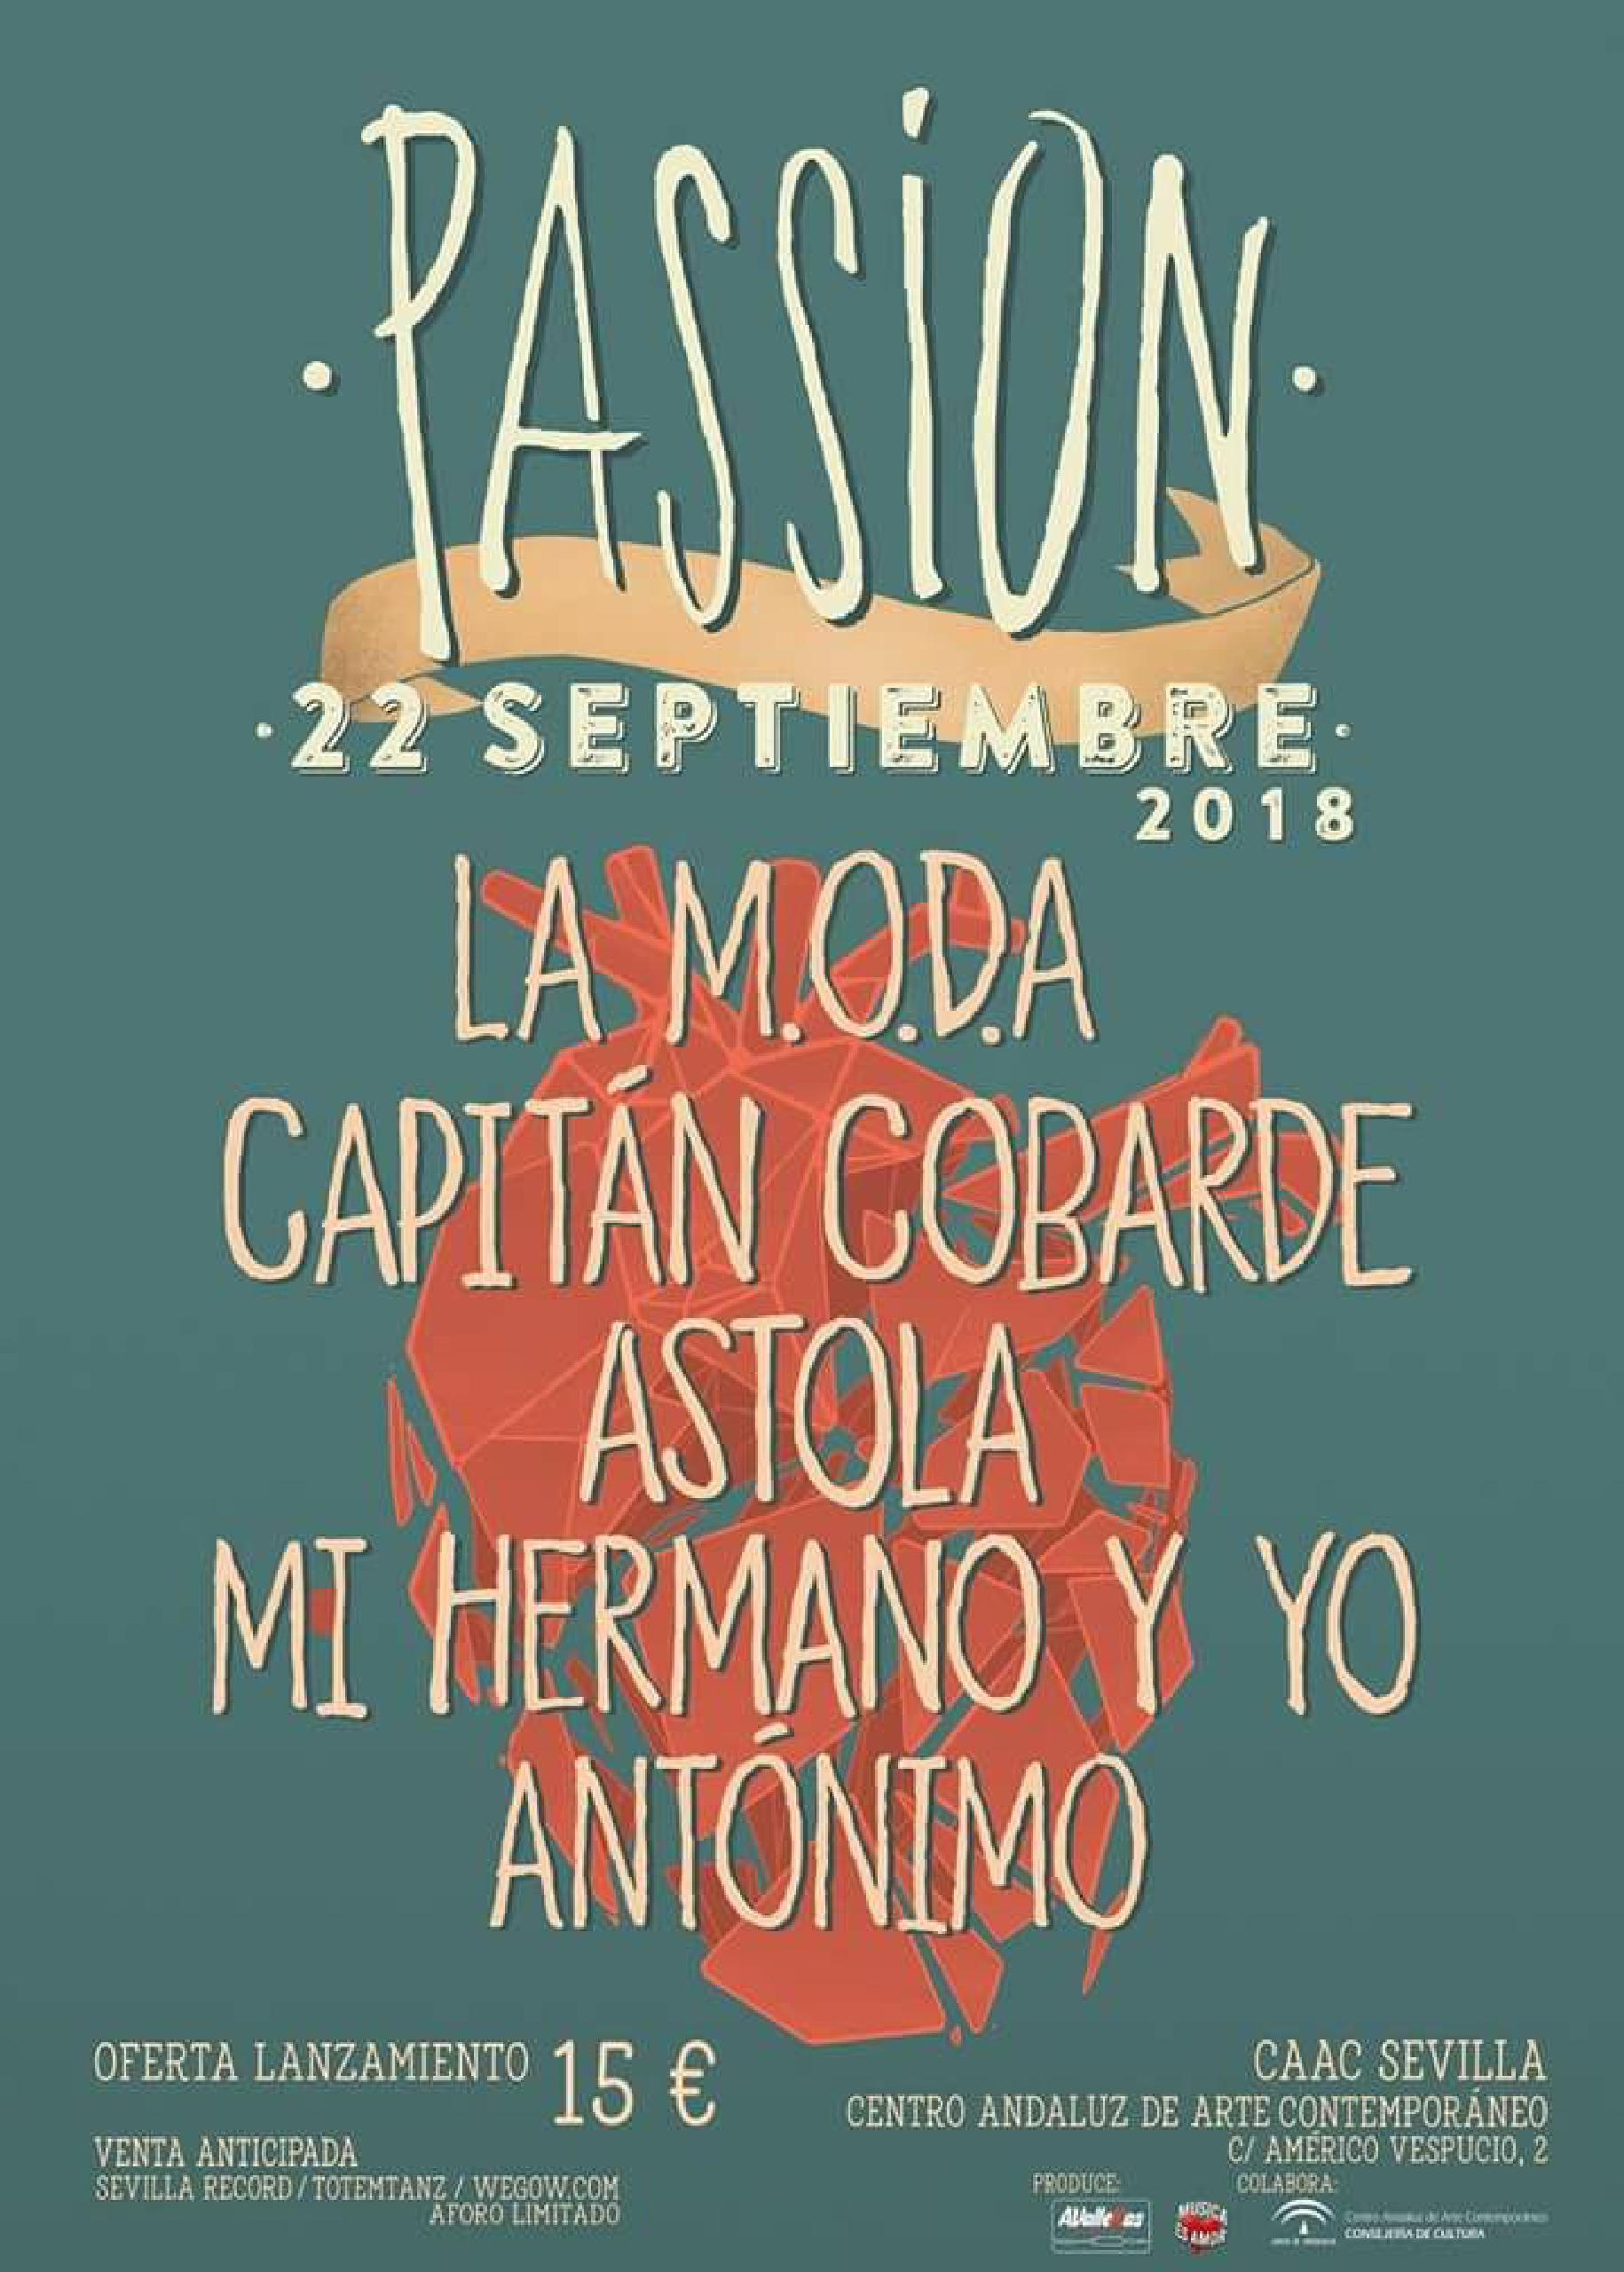 Passion Festival 2018